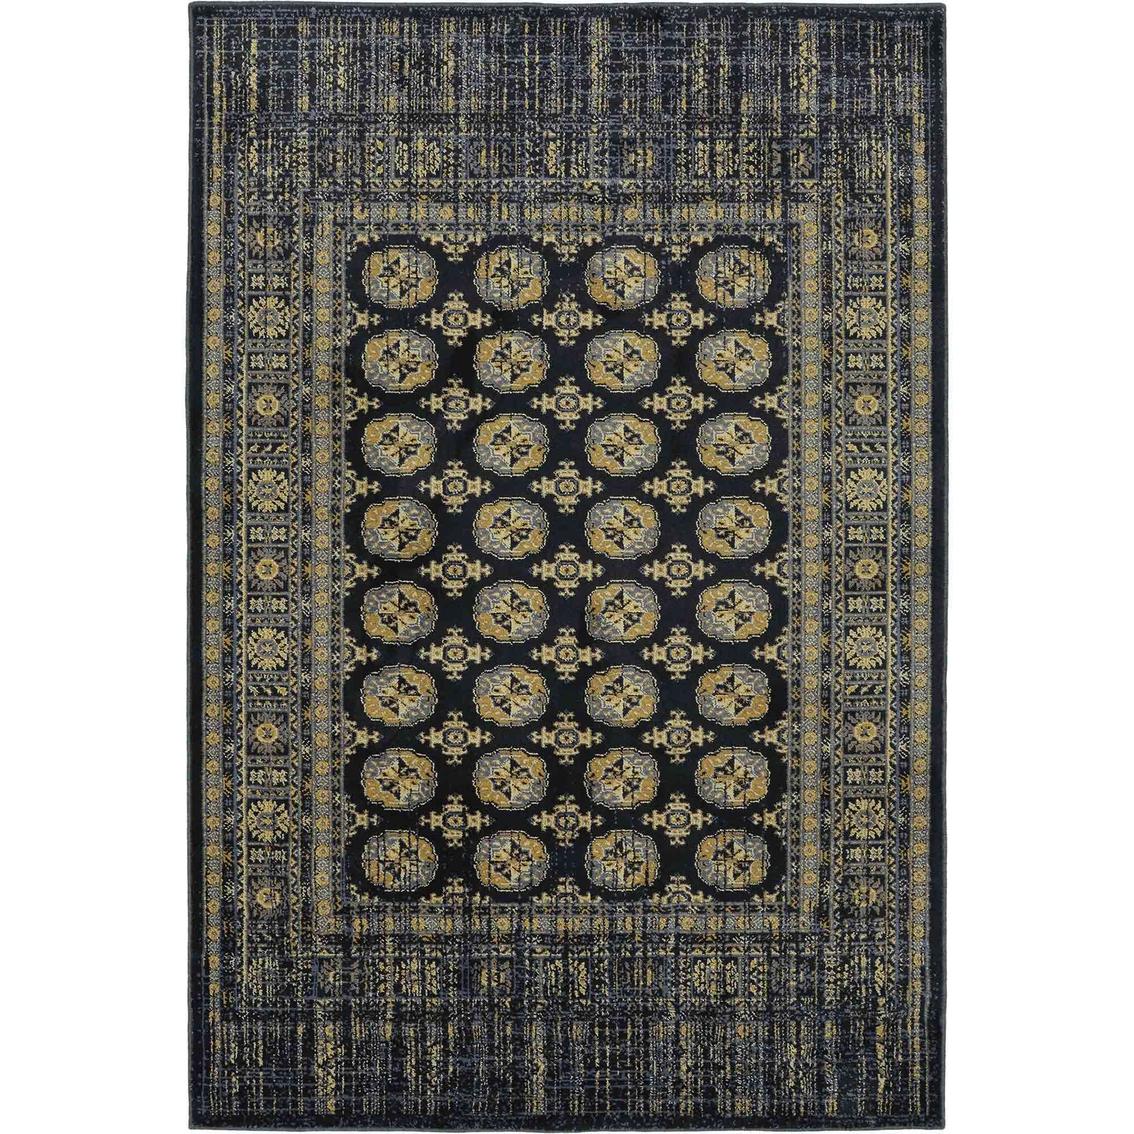 Area Rugs At Carpet Exchange